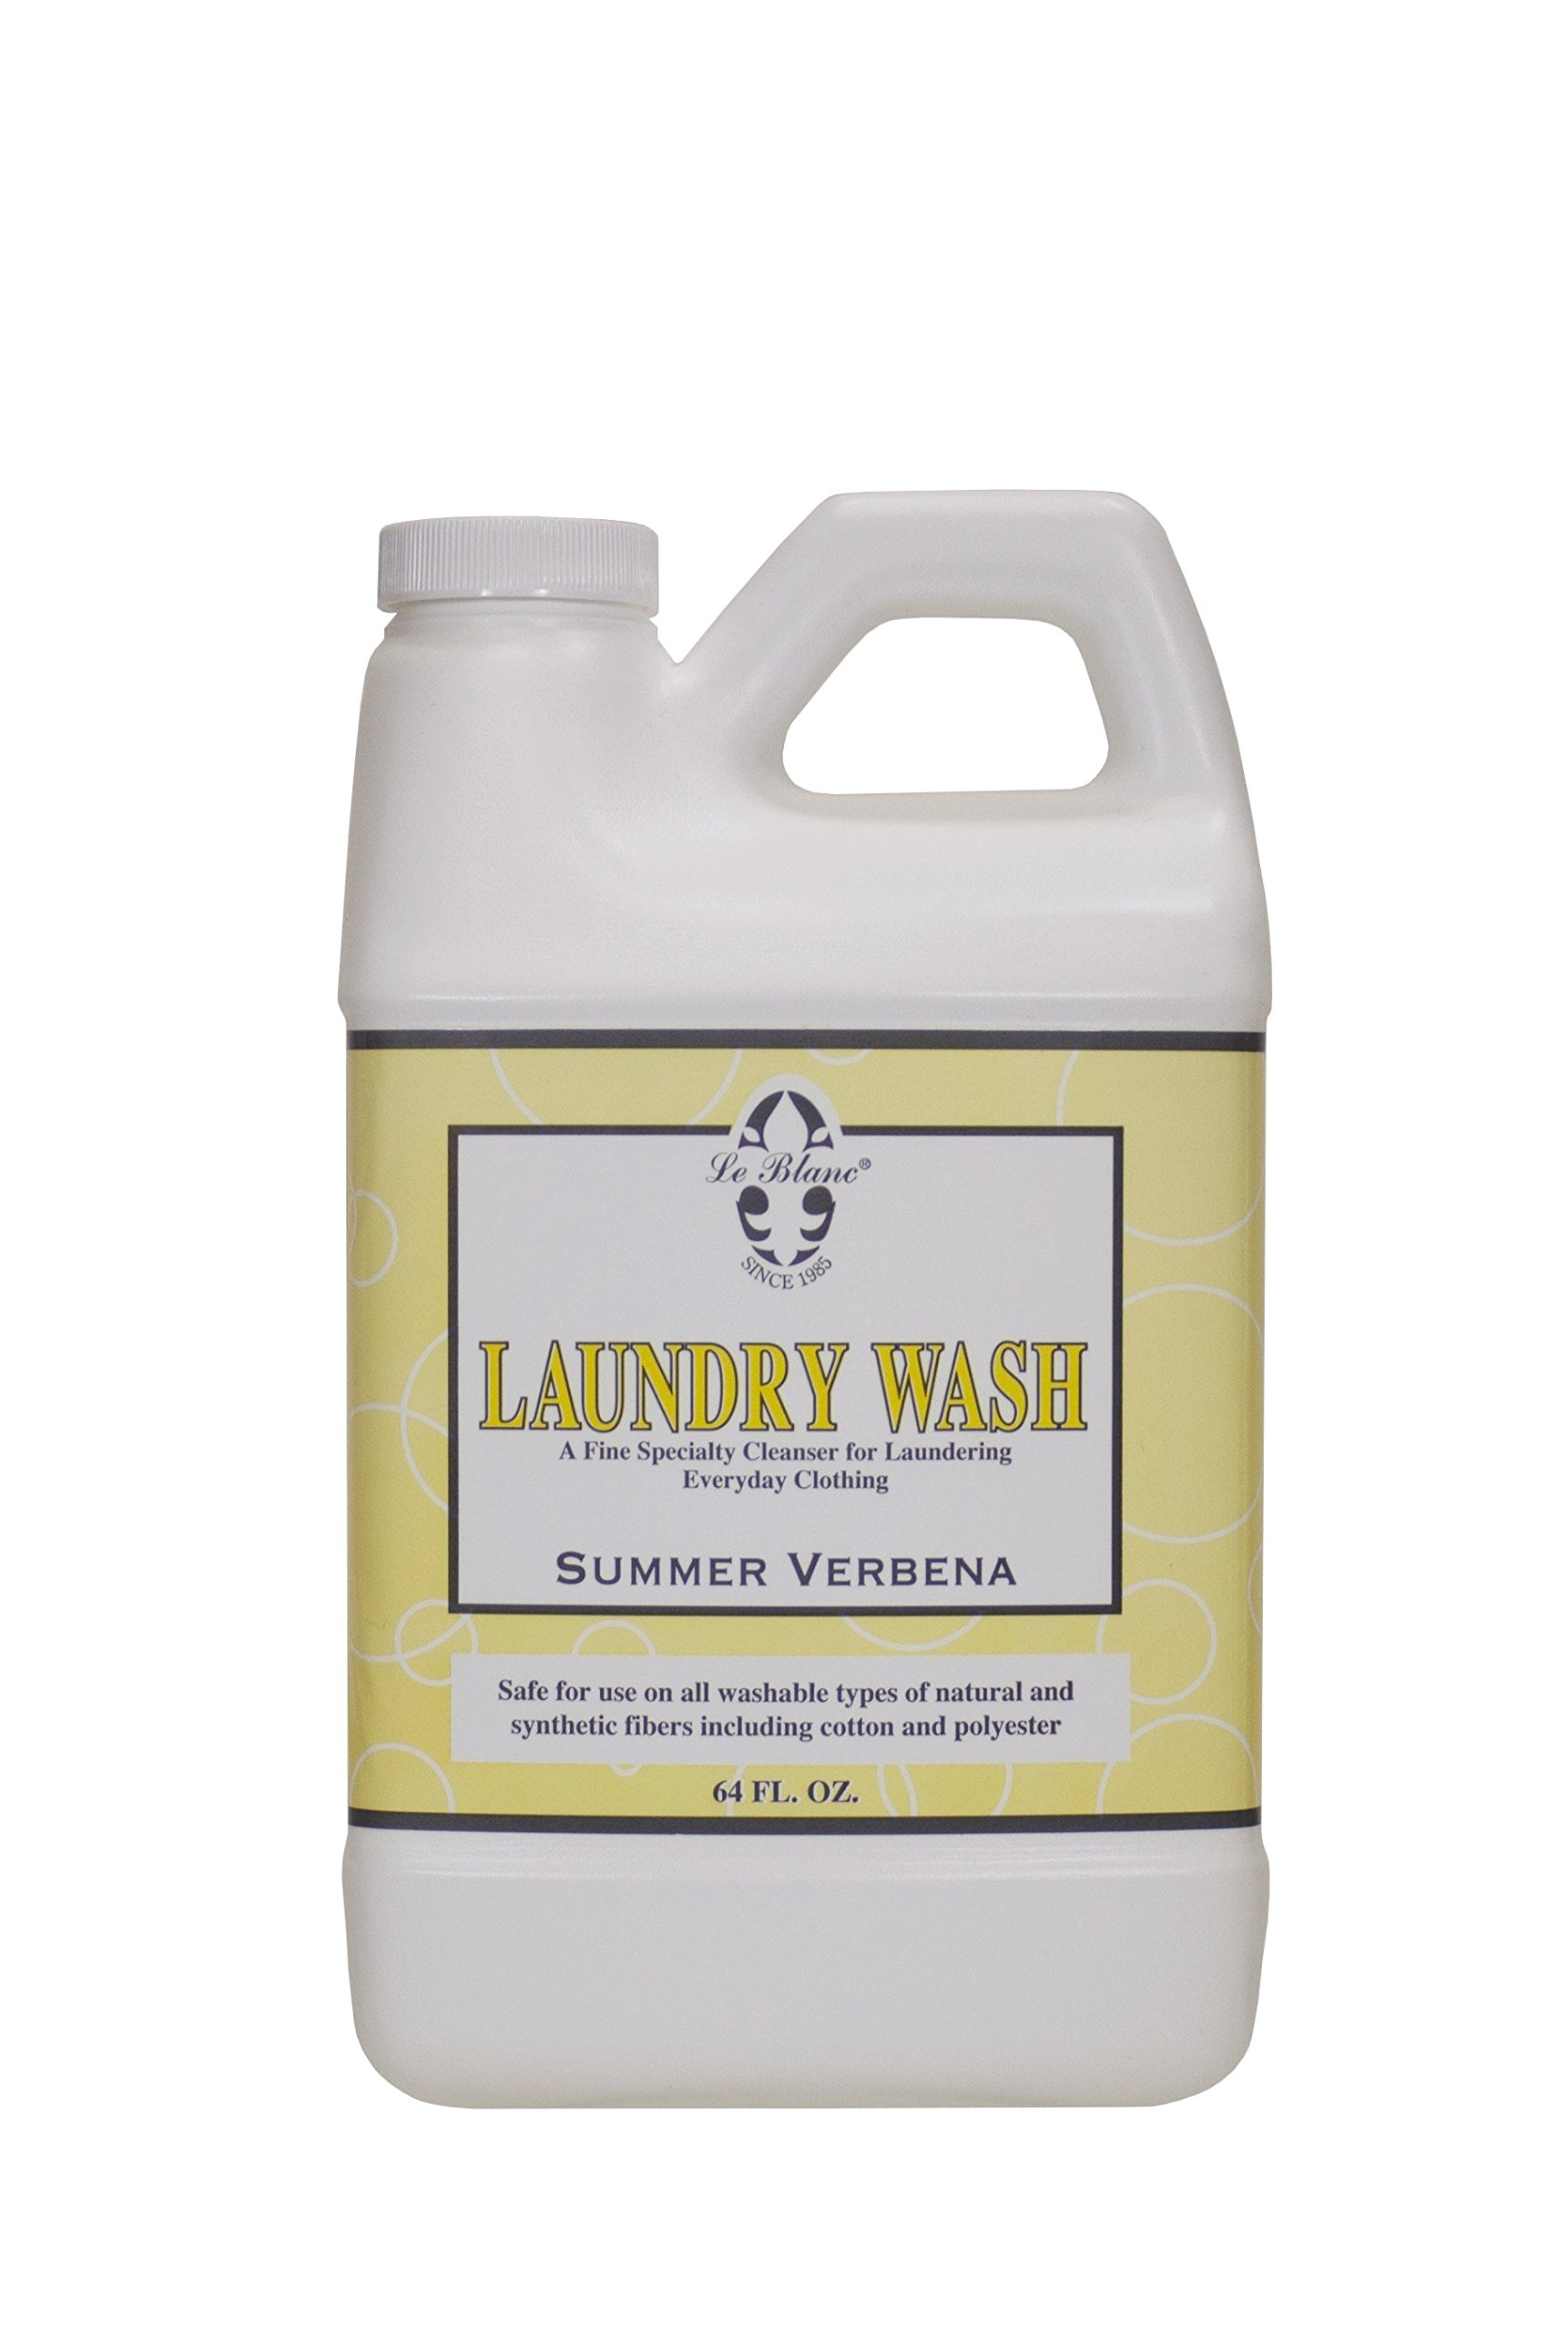 Le Blanc® Summer Verbena Laundry Wash - 64 FL. OZ., 6 Pack